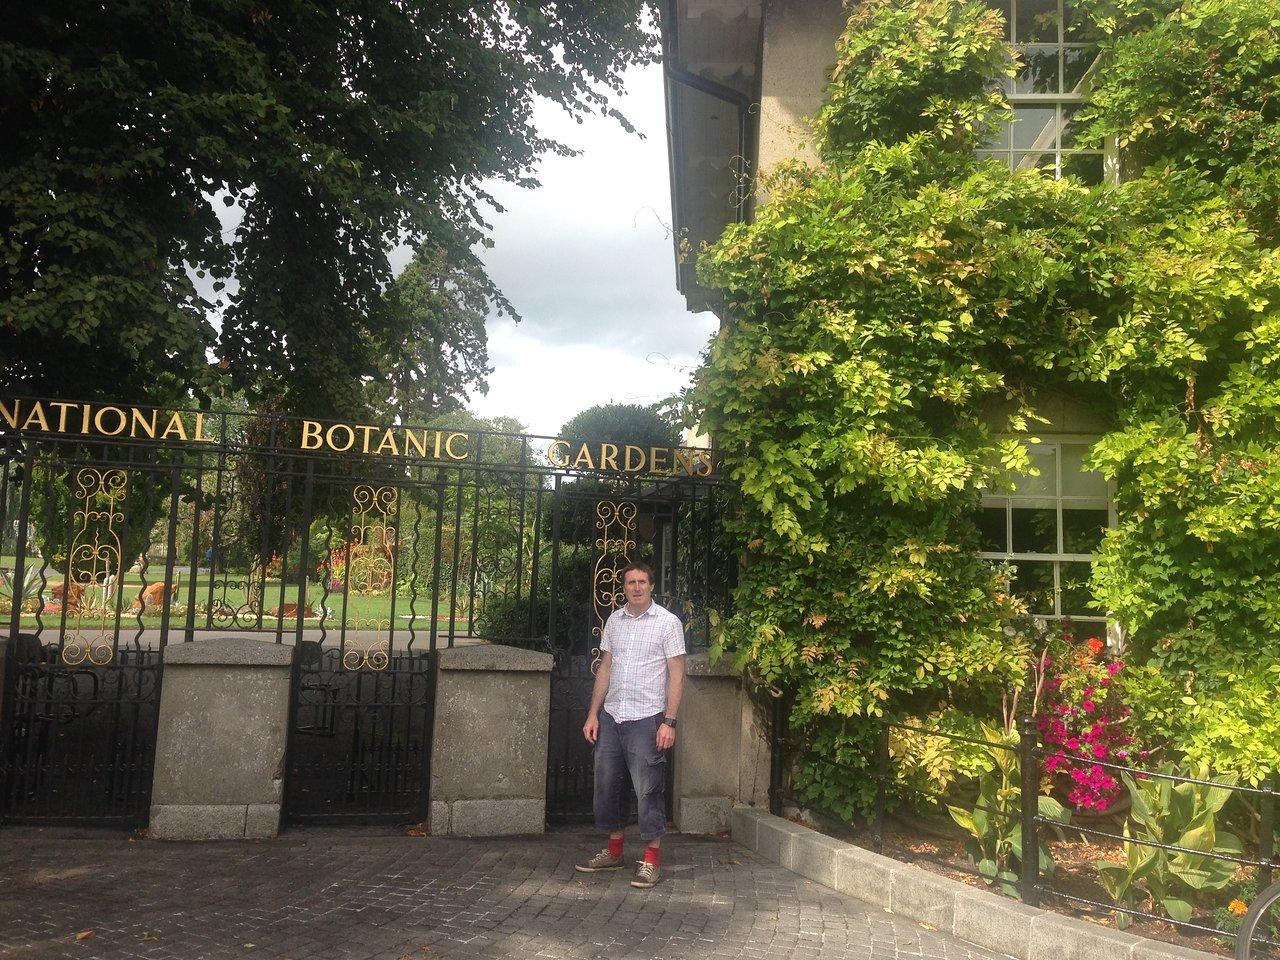 acara house b b updated 2019 prices reviews dublin ireland rh tripadvisor com